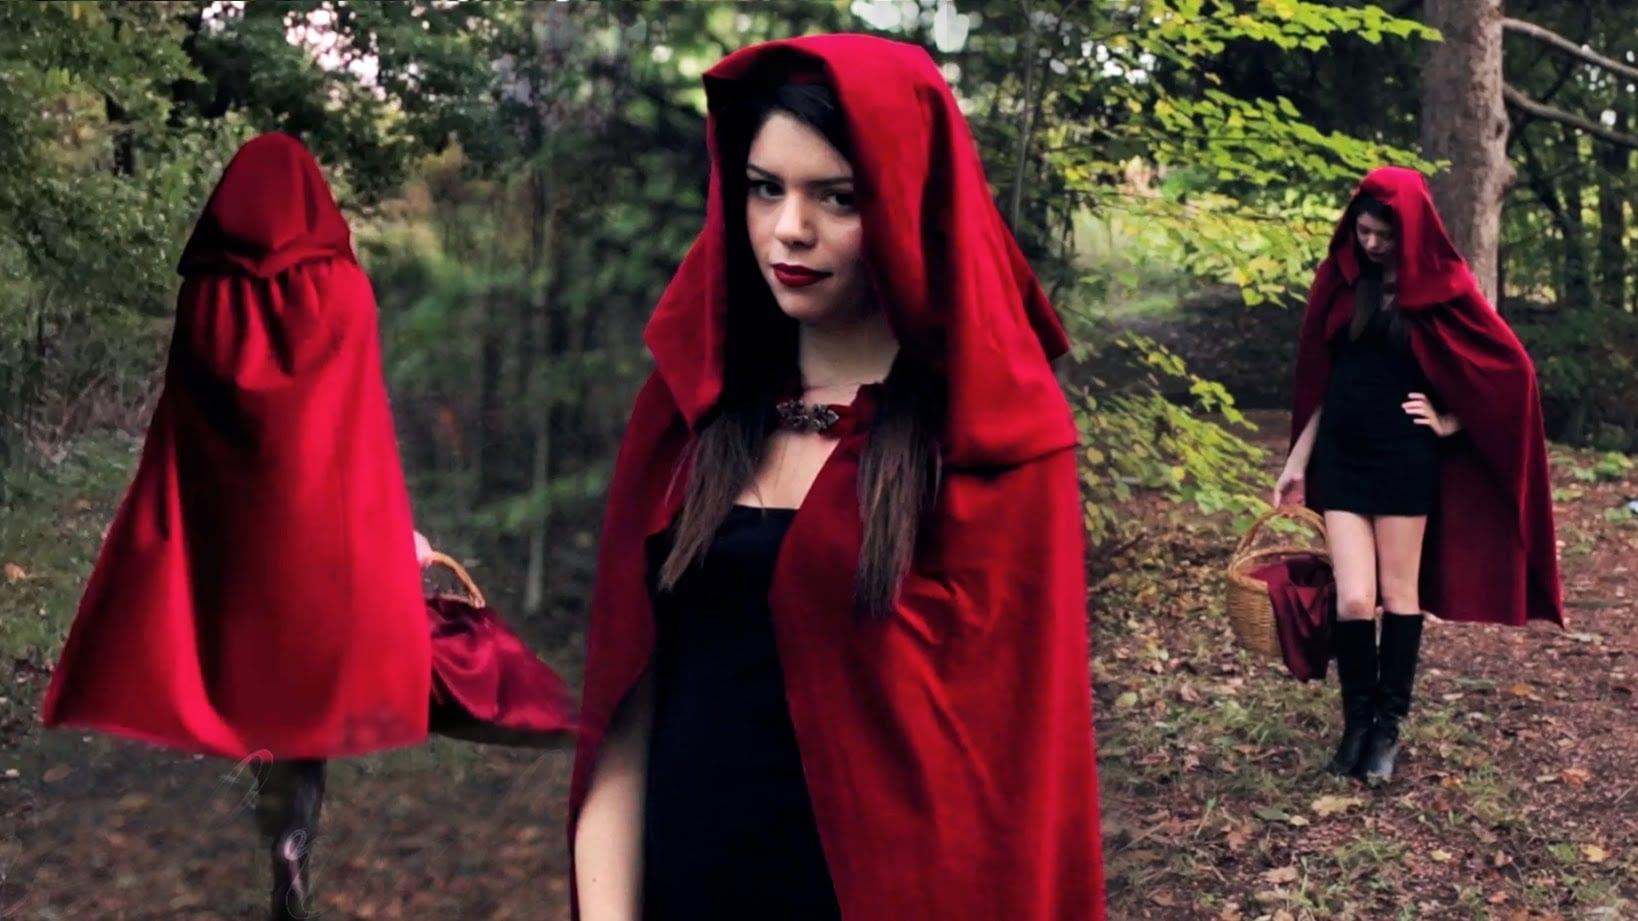 10 best halloween costume ideas for 2018